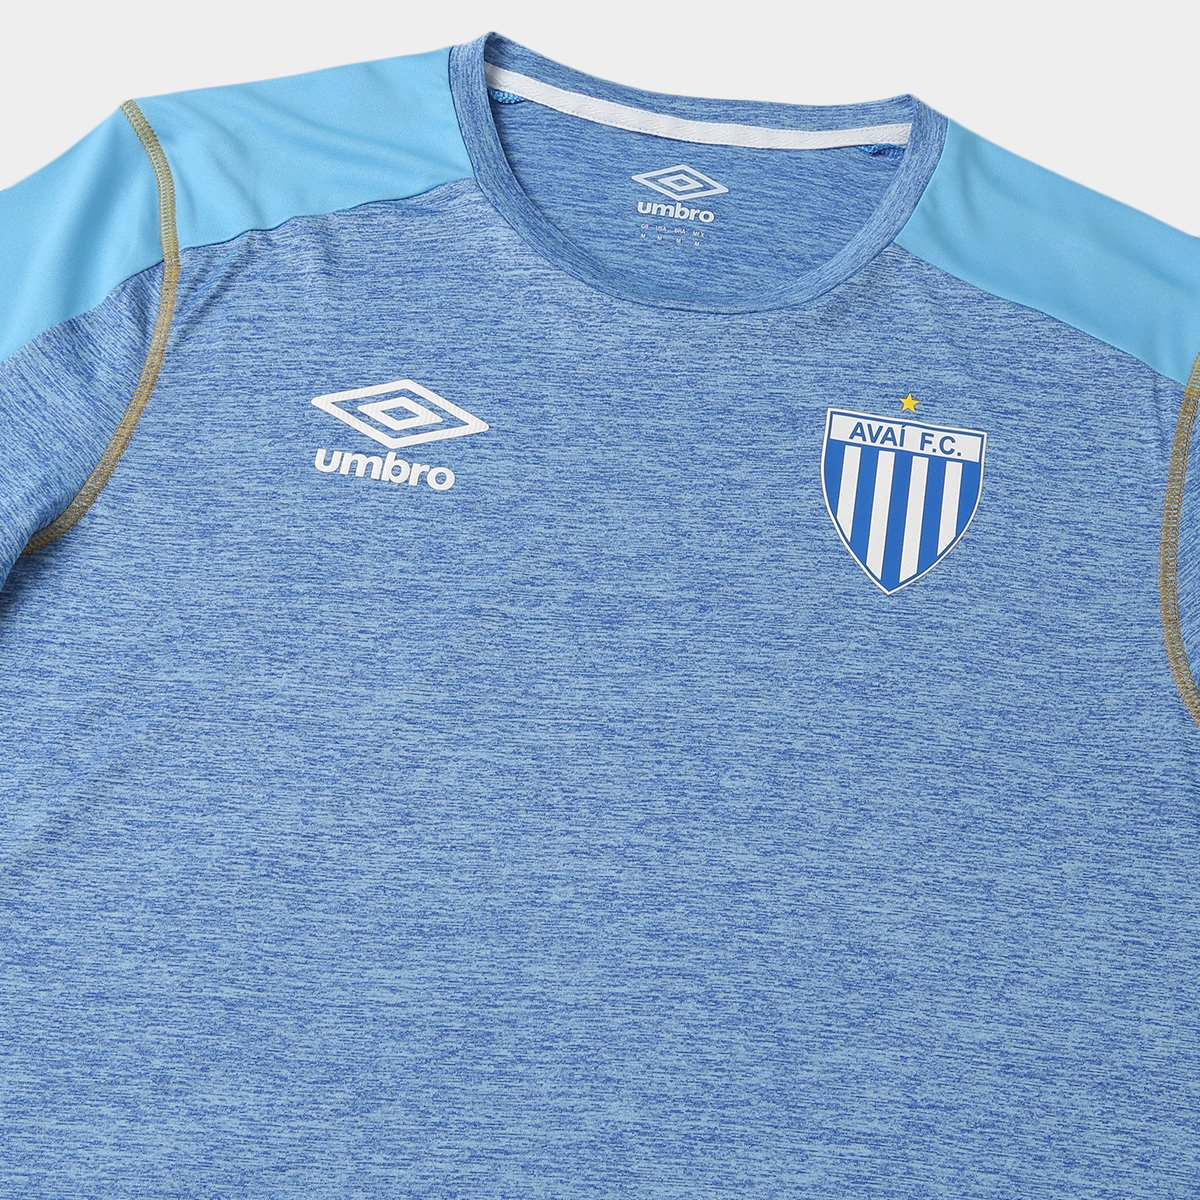 Camisa Avaí 2019 Aquecimento Umbro Masculina - 3